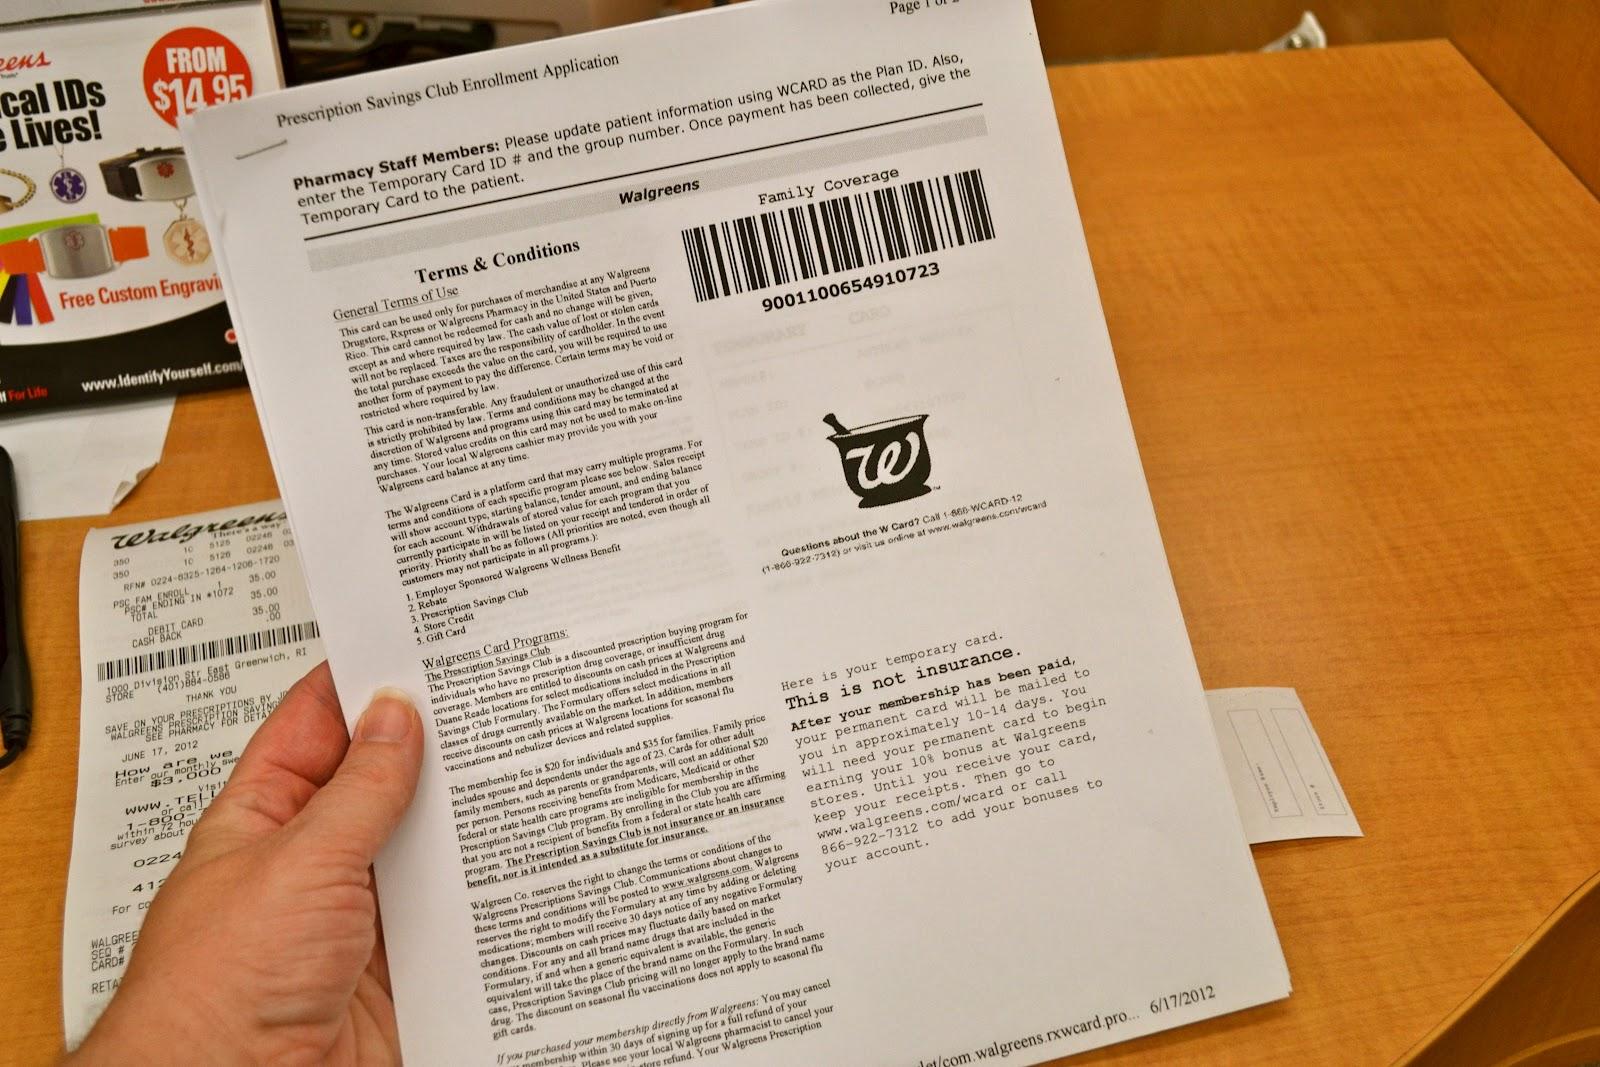 walgreens prescription savings plan - Walgreens Prescription Card